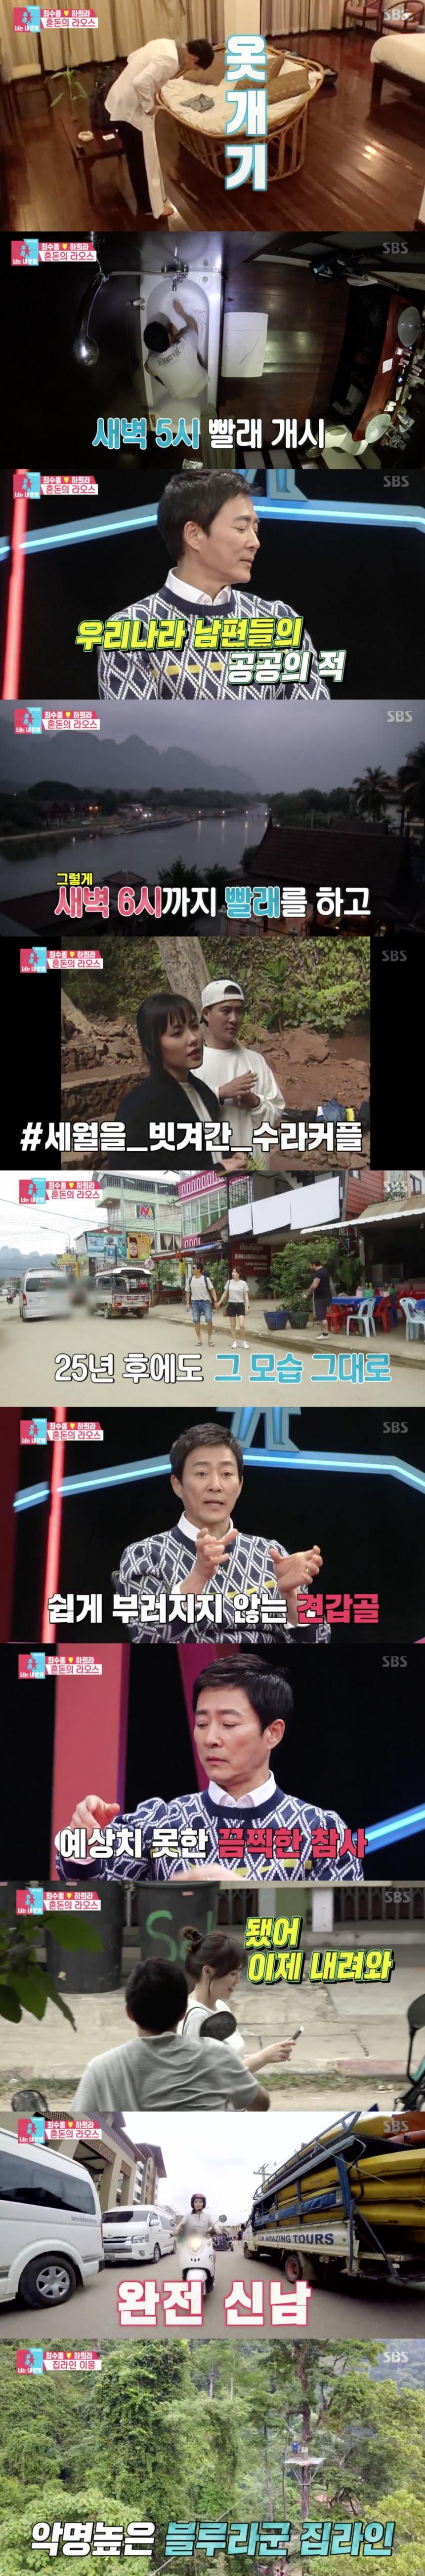 SBS 동상이몽 시즌2 - 너는 내 운명 방송 캡쳐